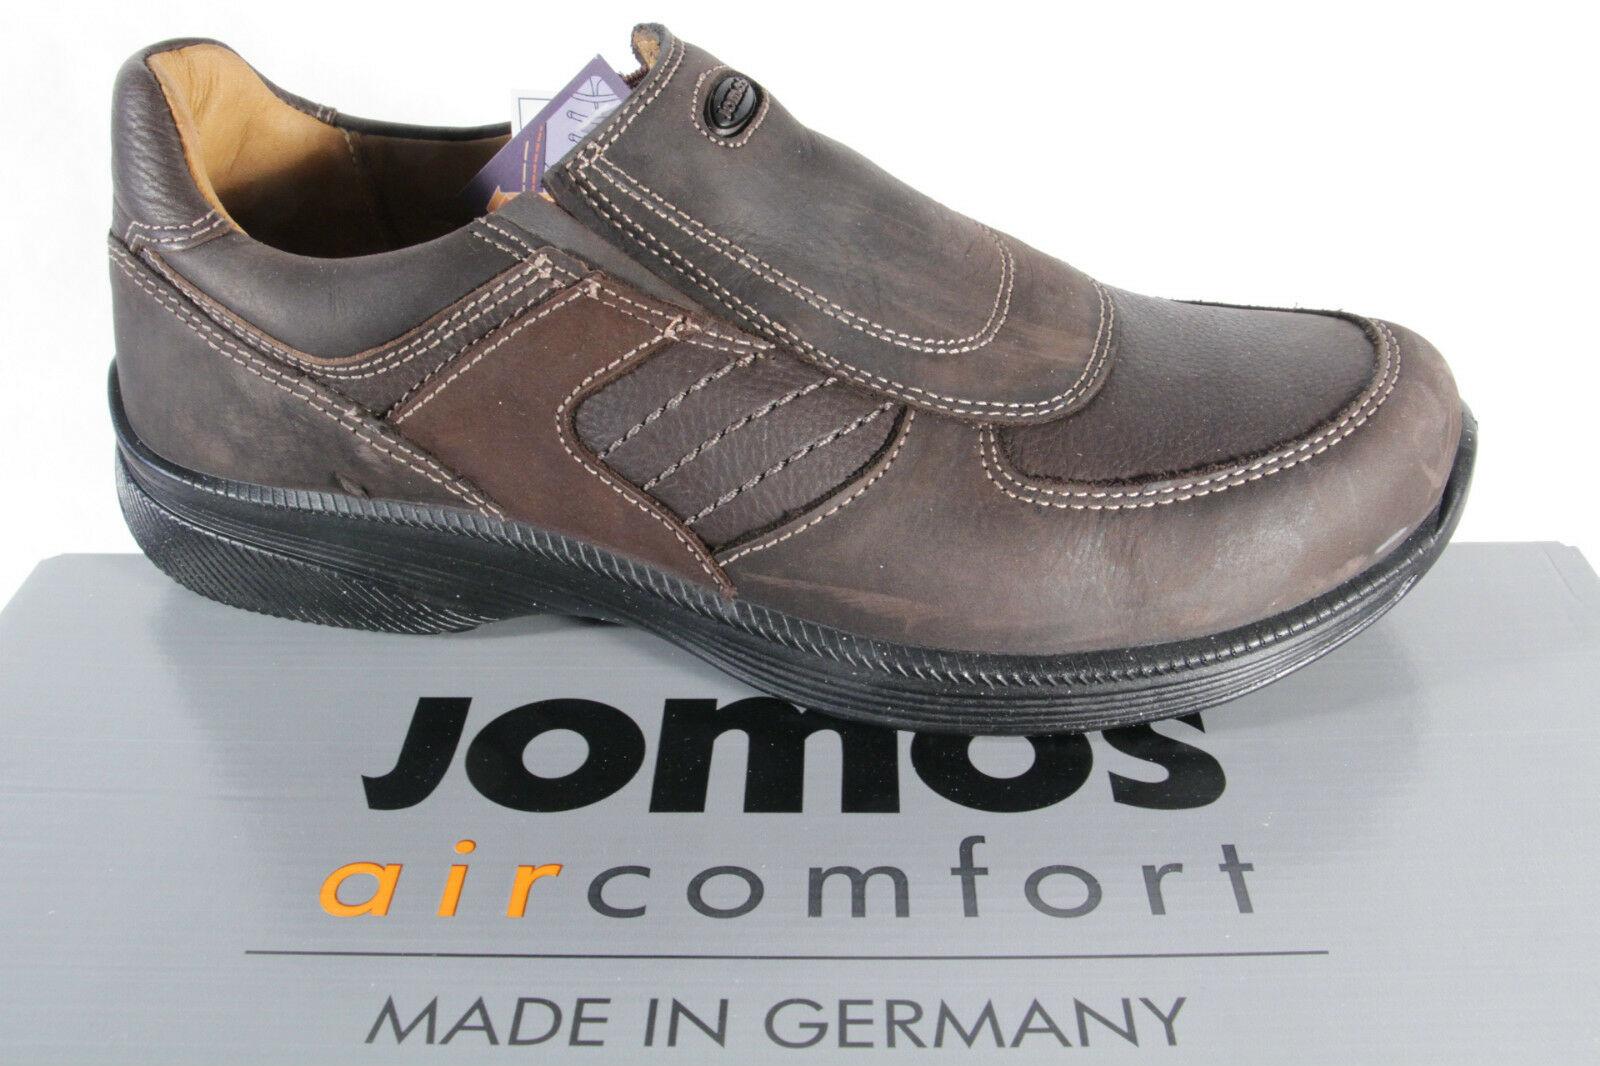 Jomos aircomfort Herren Slipper, Lederwechselfußbett, braun, extra weit, NEU